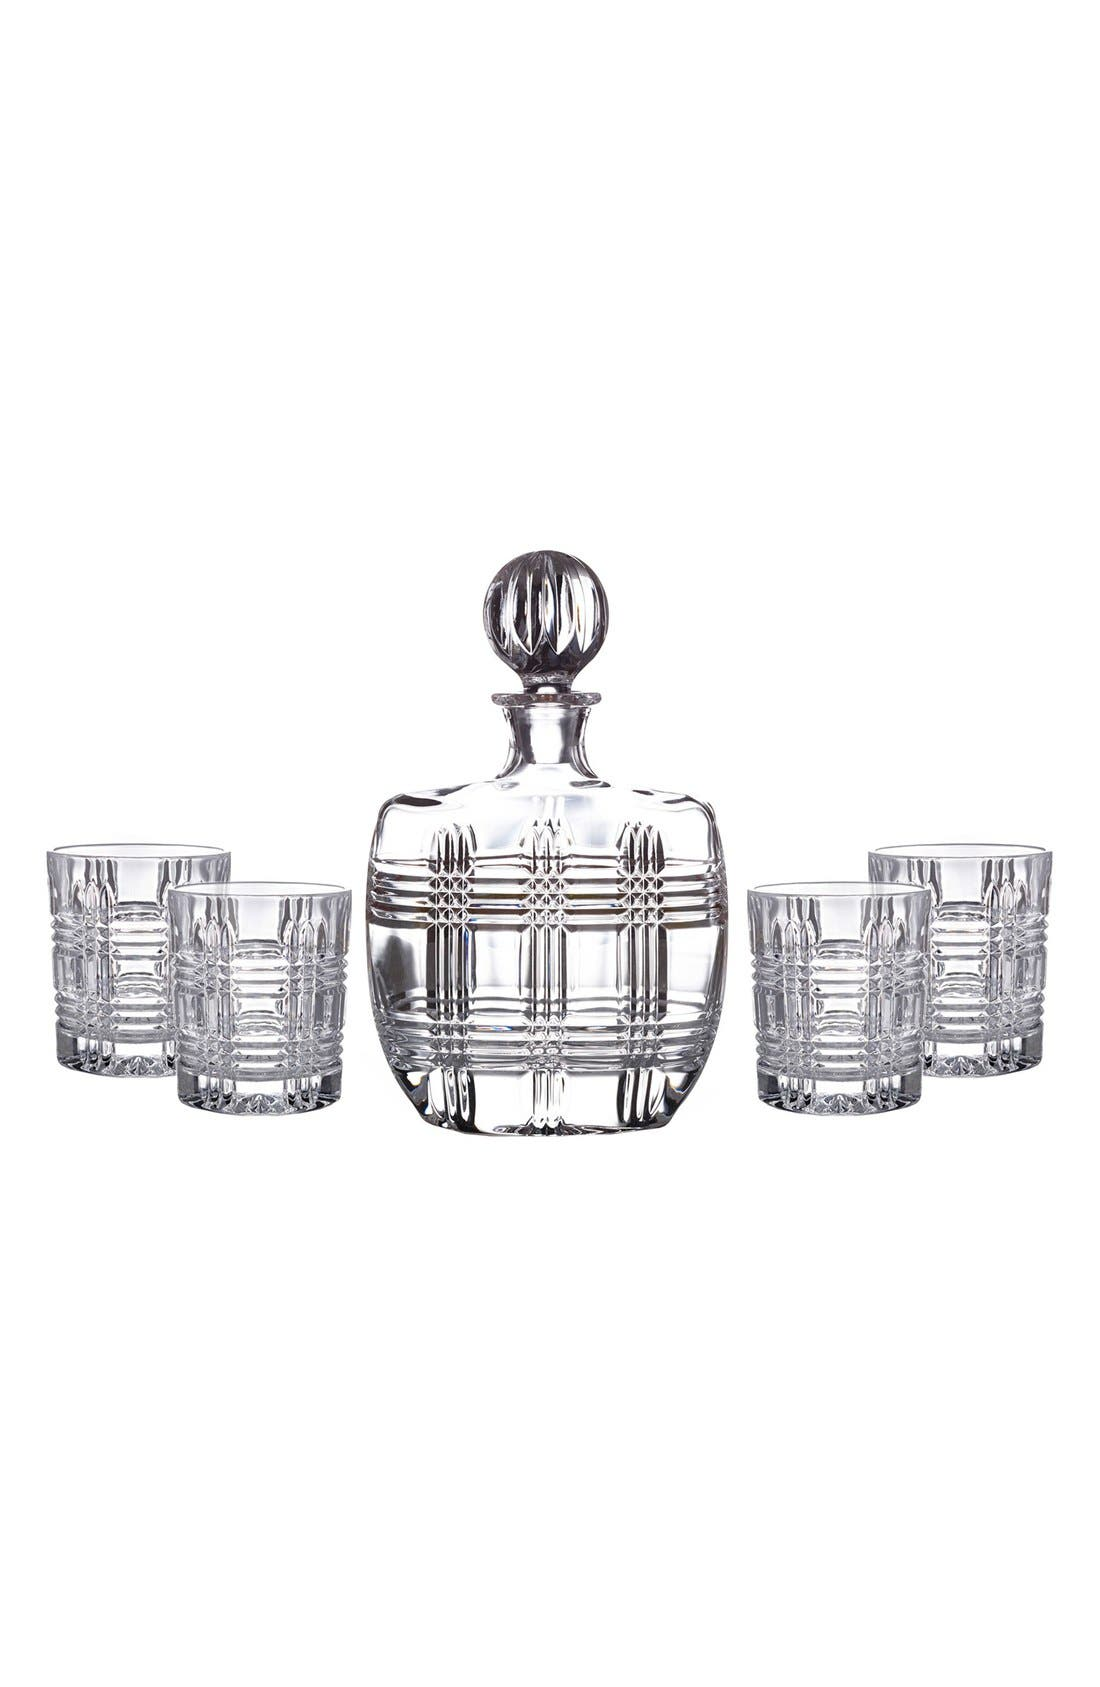 Alternate Image 1 Selected - American Atelier Bridgeport 5-Piece Decanter & Whiskey Glasses Set